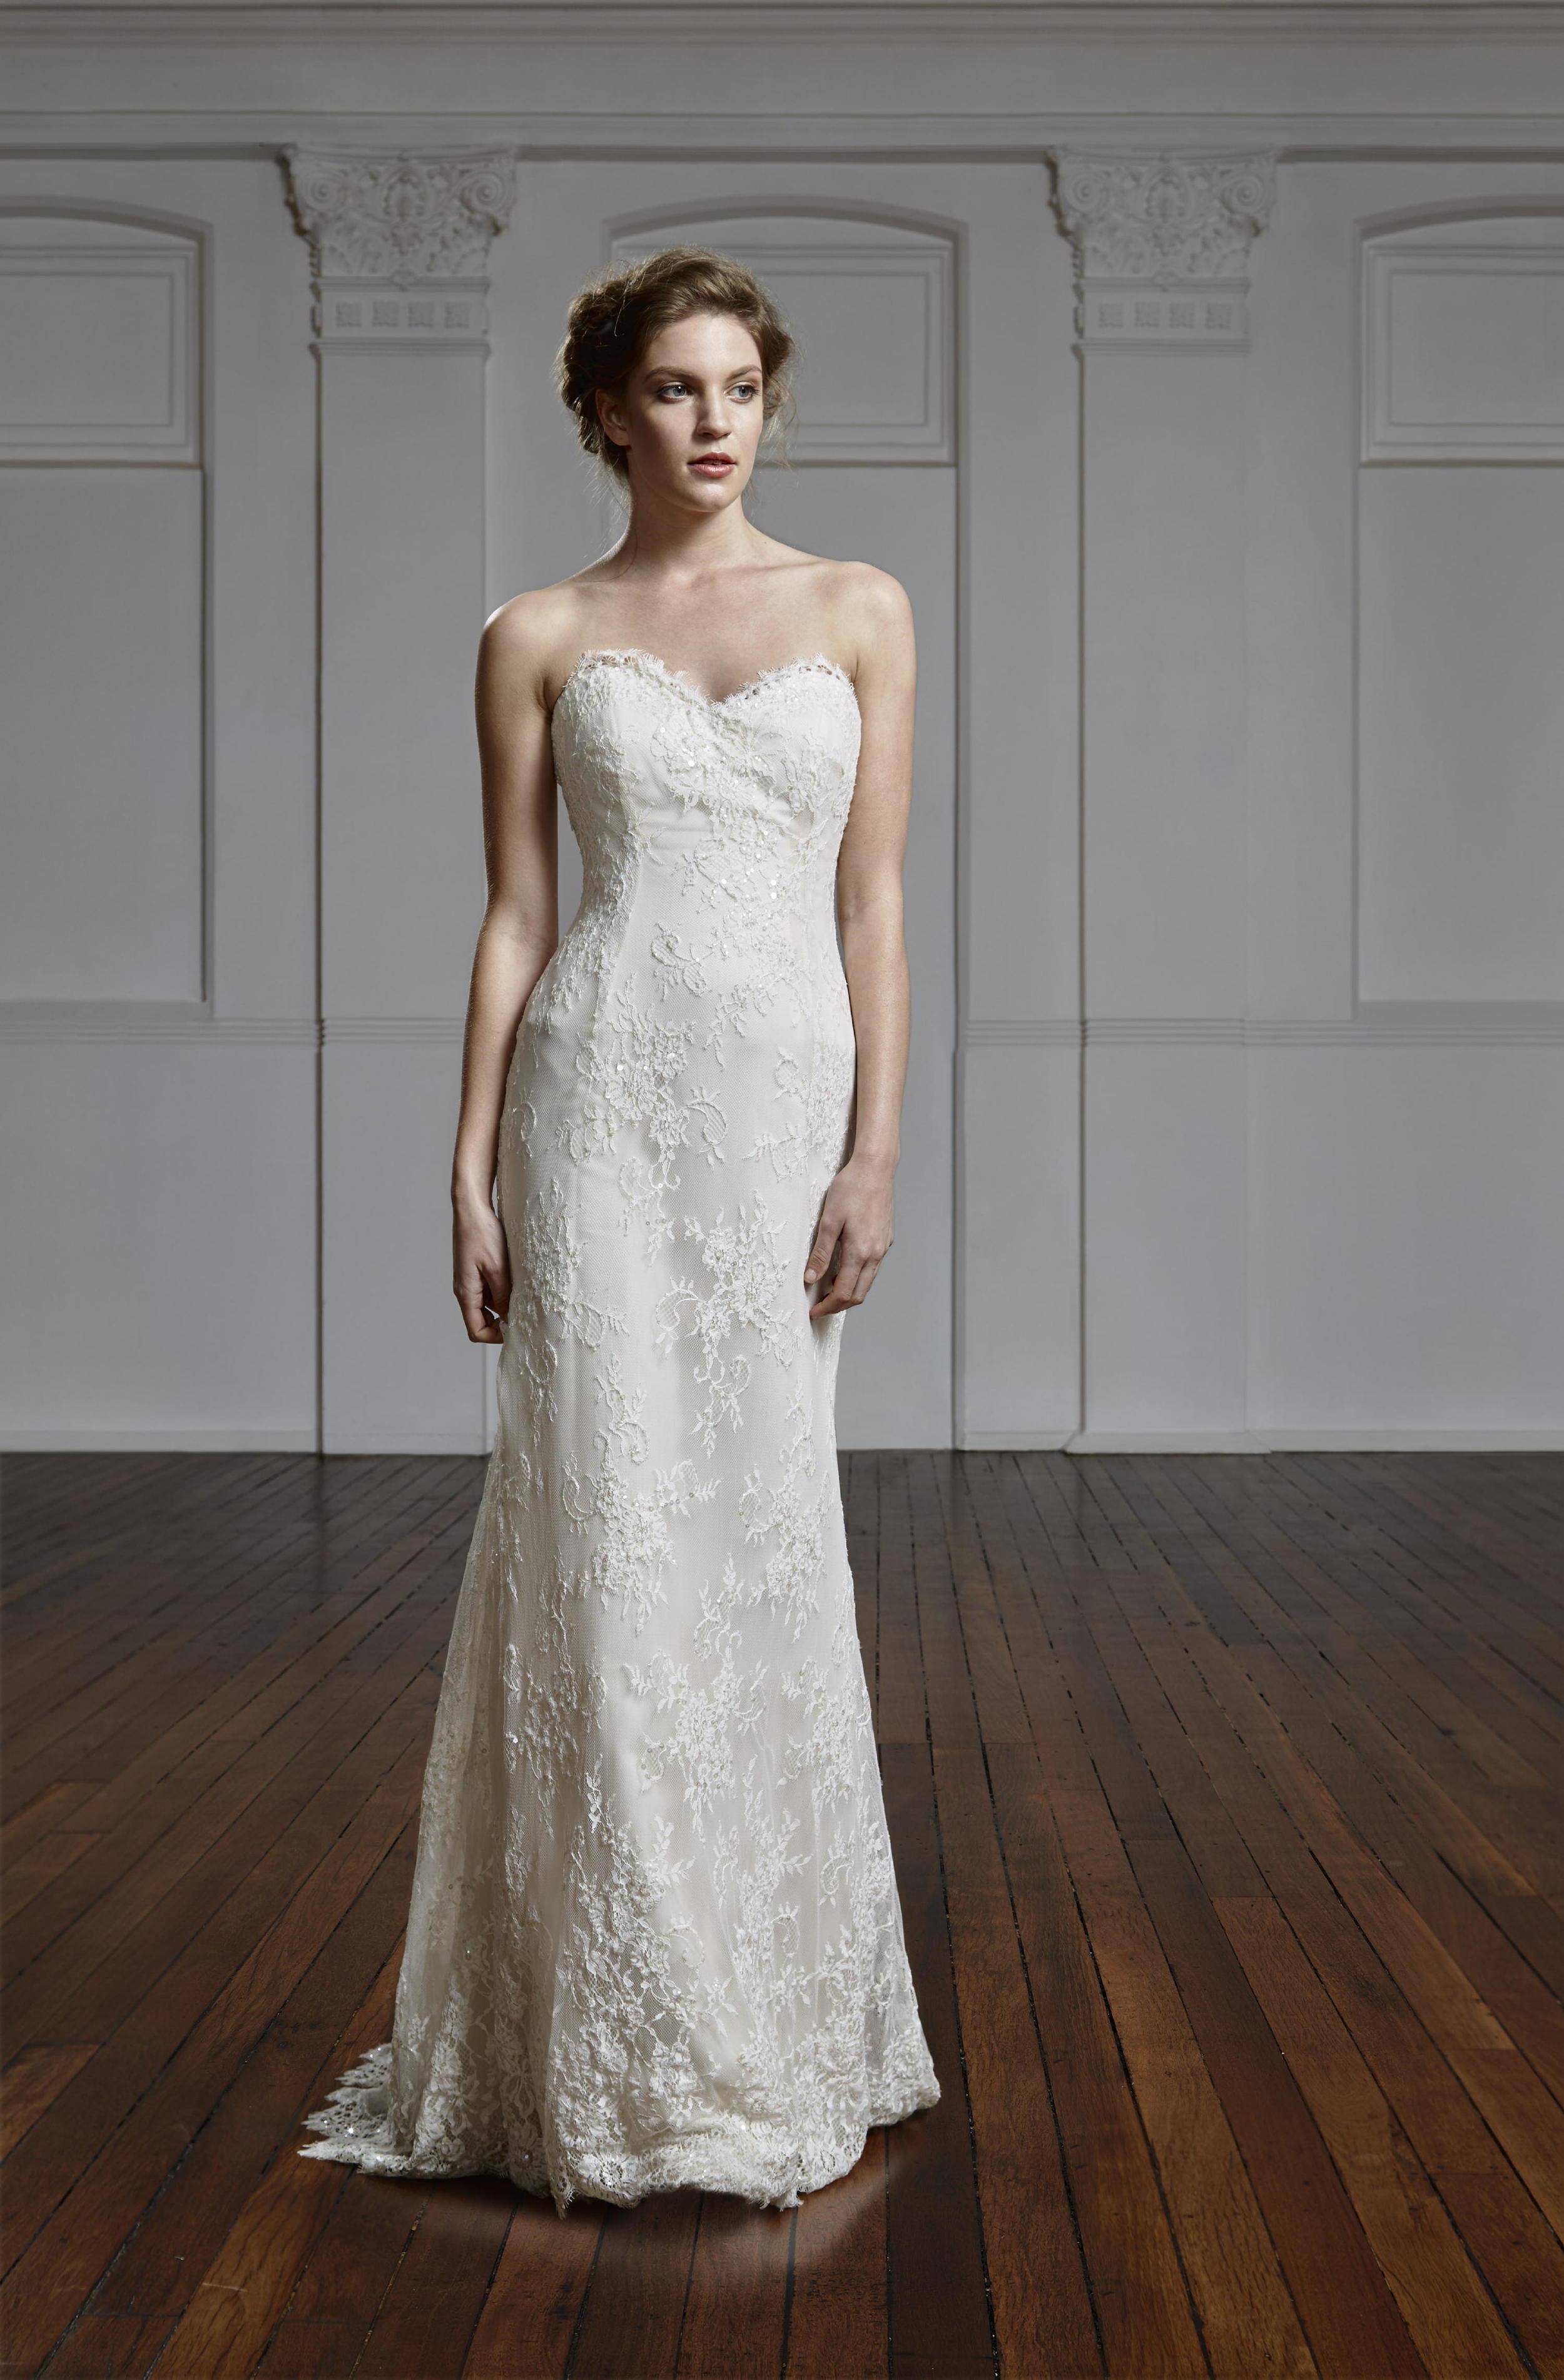 Seraphina bridal design_TanyaAnic_©GrantSparkesCarroll_196 a.jpg